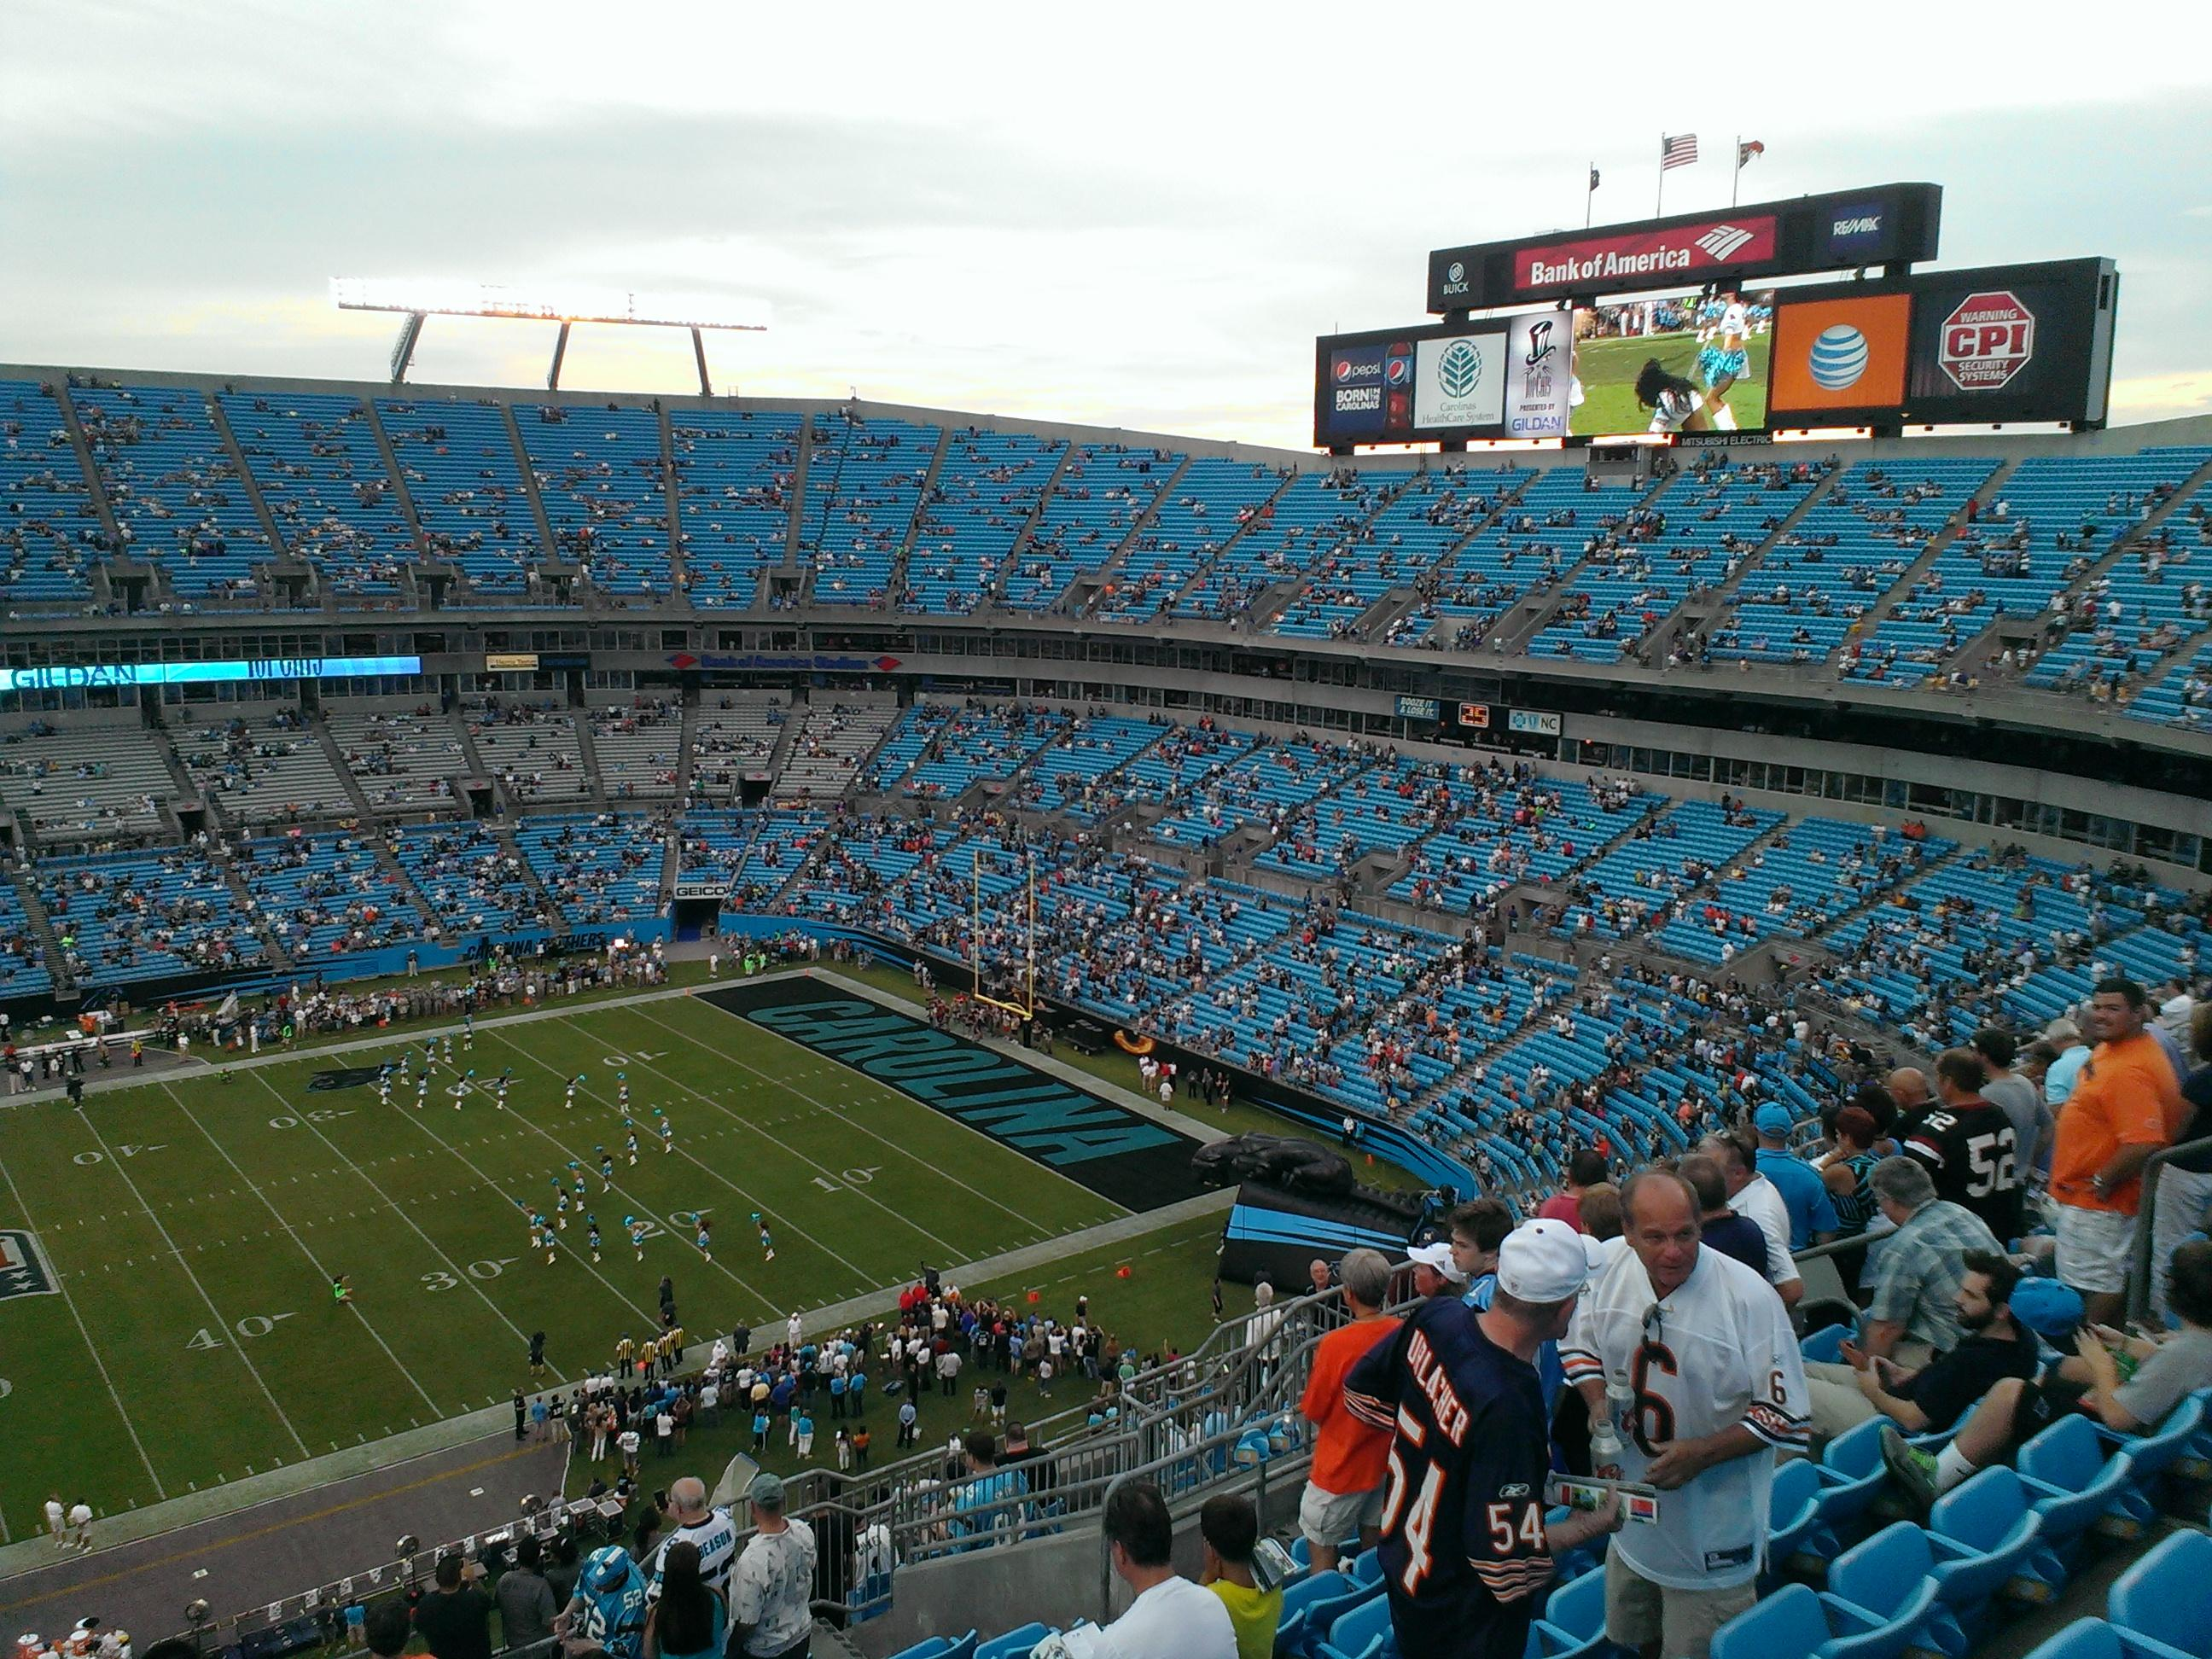 Bank of America Stadium Section 515 Row 13 Seat 15